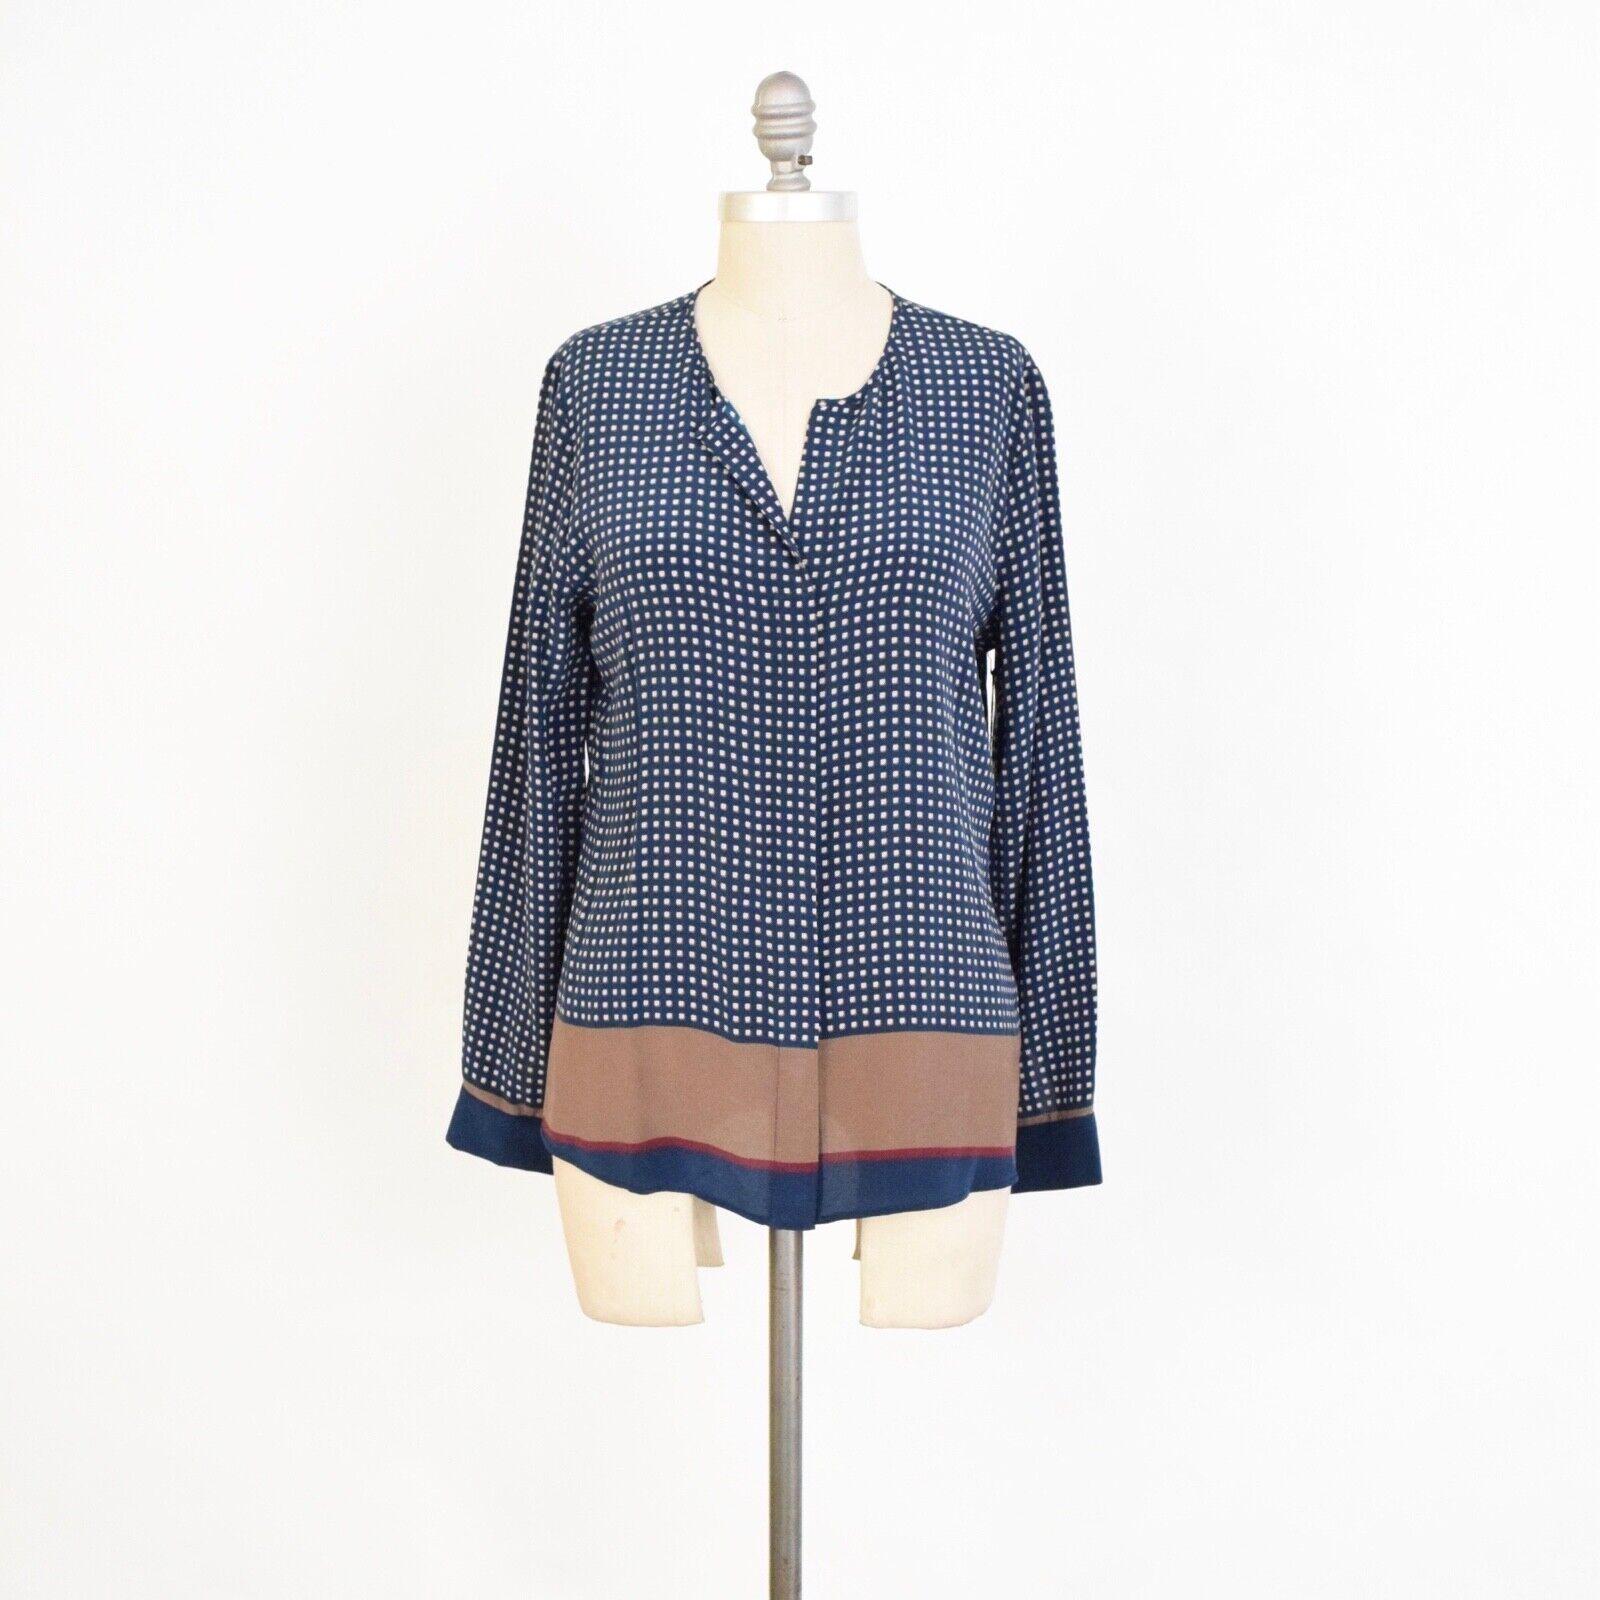 Ecru Blouse S Teal bluee Foulard Print Silk Long Sleeve Button Down NWT